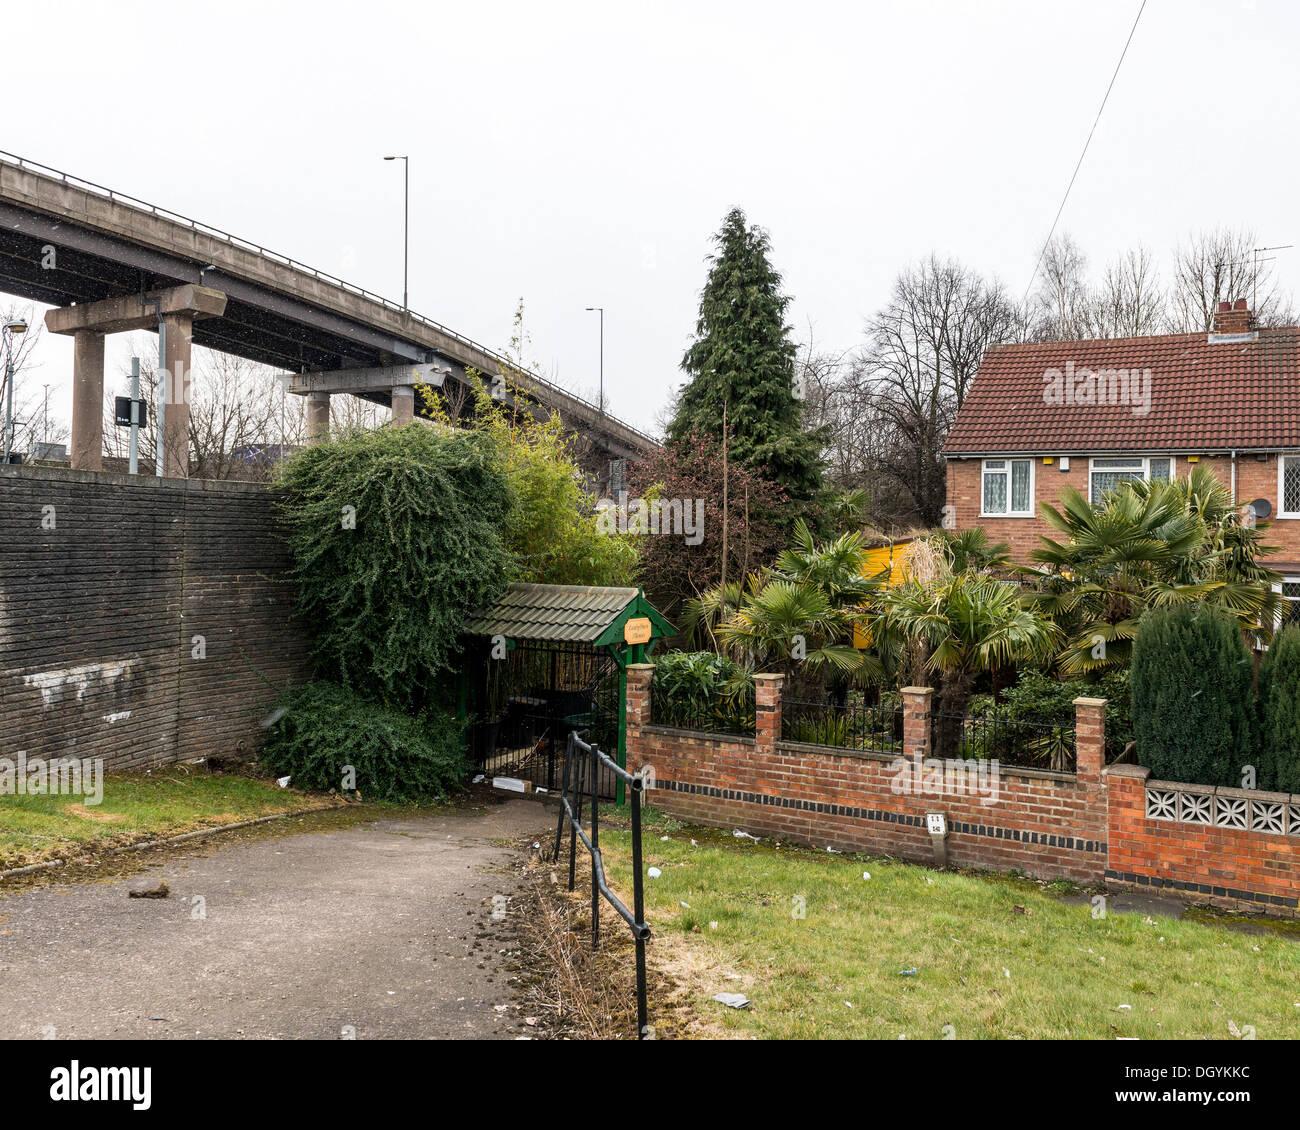 Spaghetti Junction (Gravelly Hill Interchange), Birmingham, United Kingdom. Architect: unknown, 1972. Stock Photo